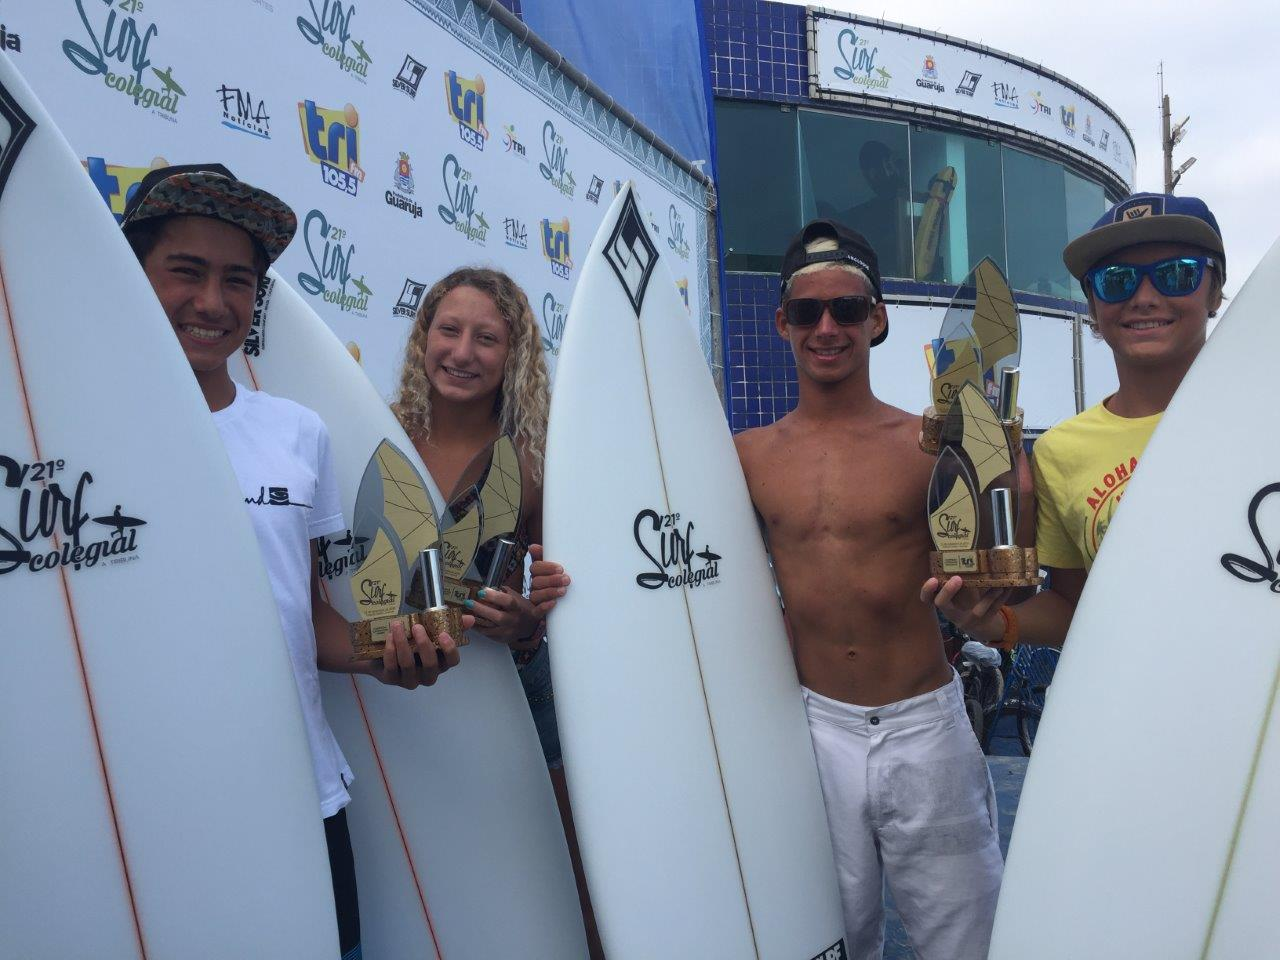 tribuna-surf-2016-por-fabio-maradei-1